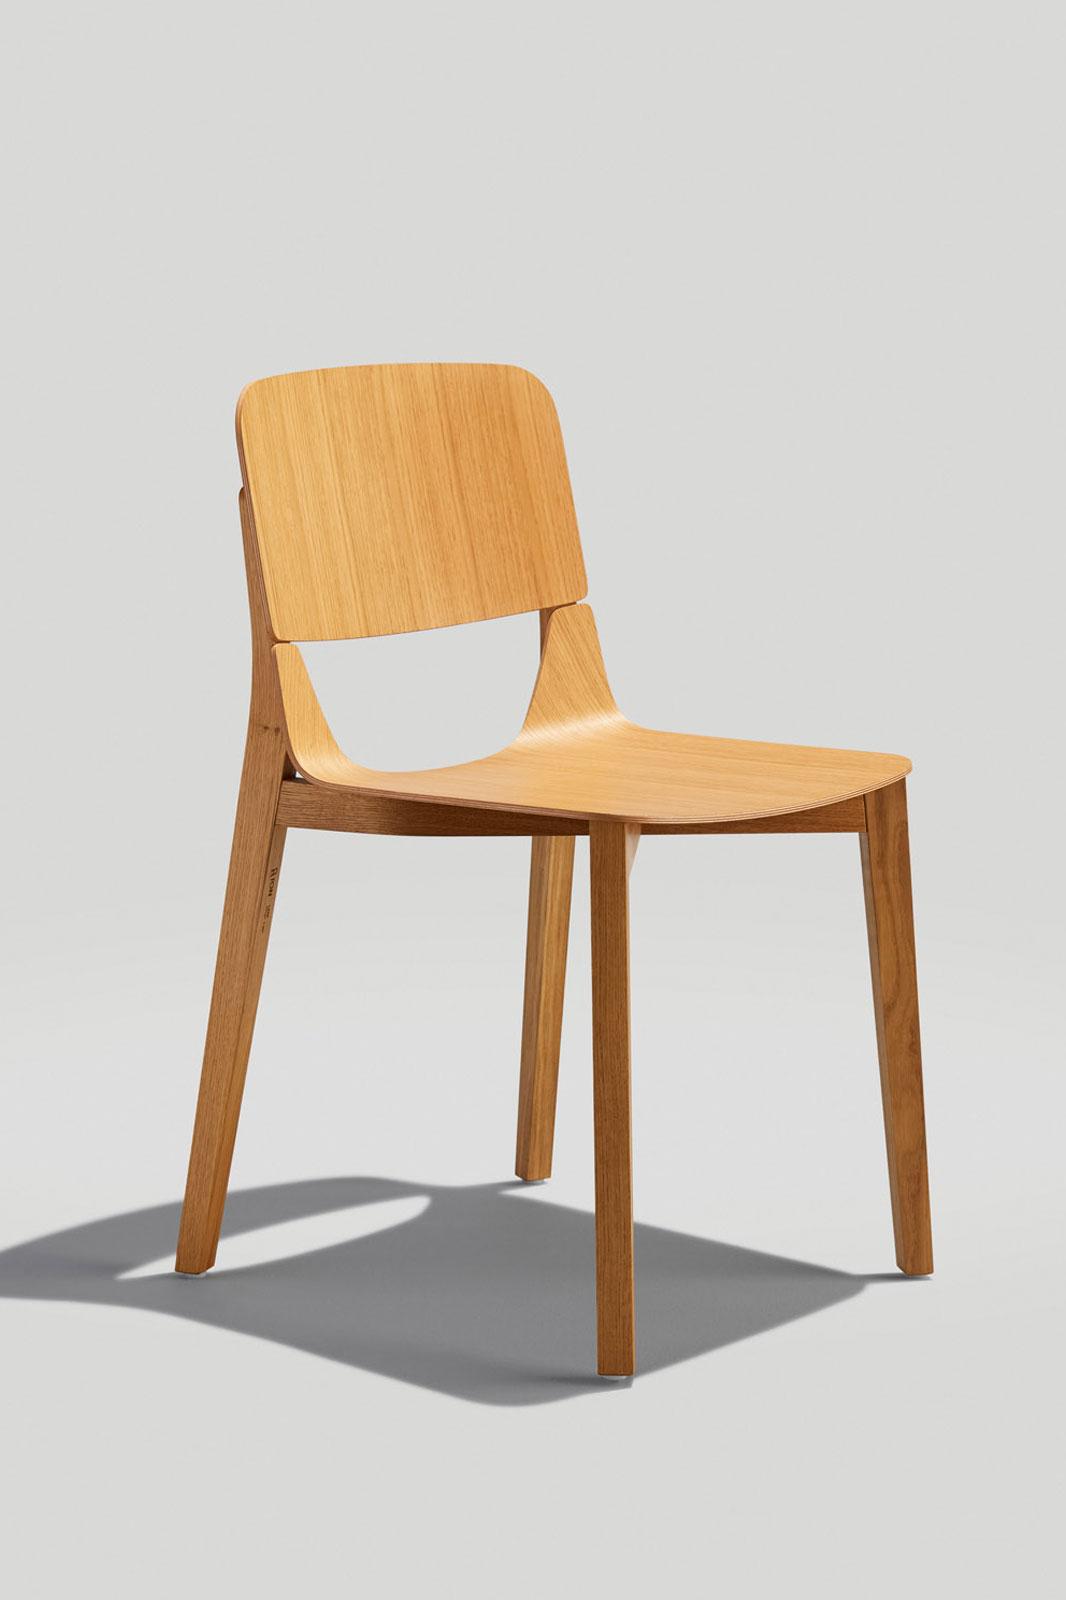 leaf-chair-the-bierman-group